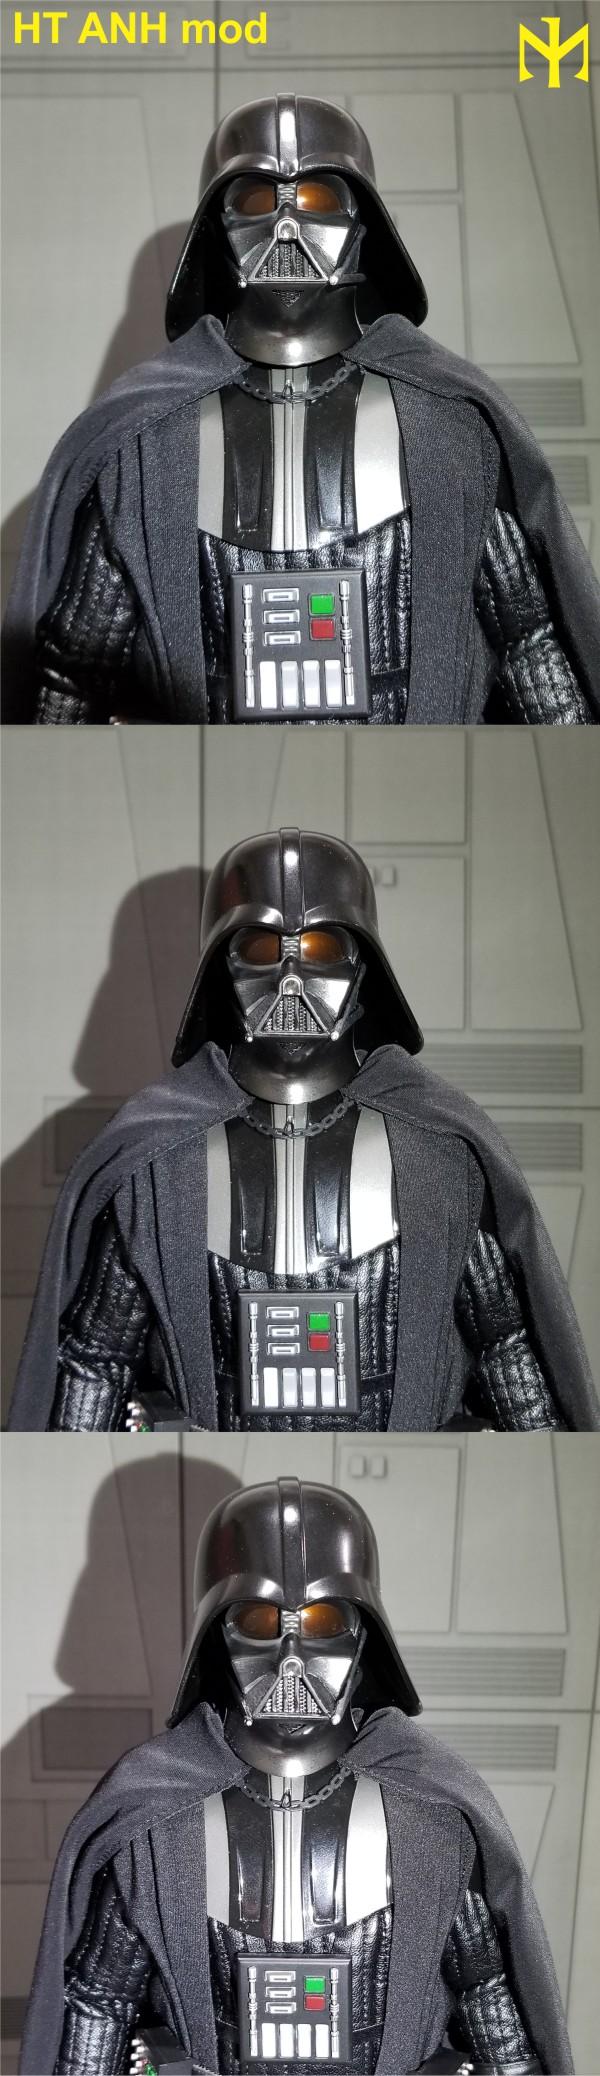 STAR WARS New customizing Hot Toys ESB Vader head Htdvan14